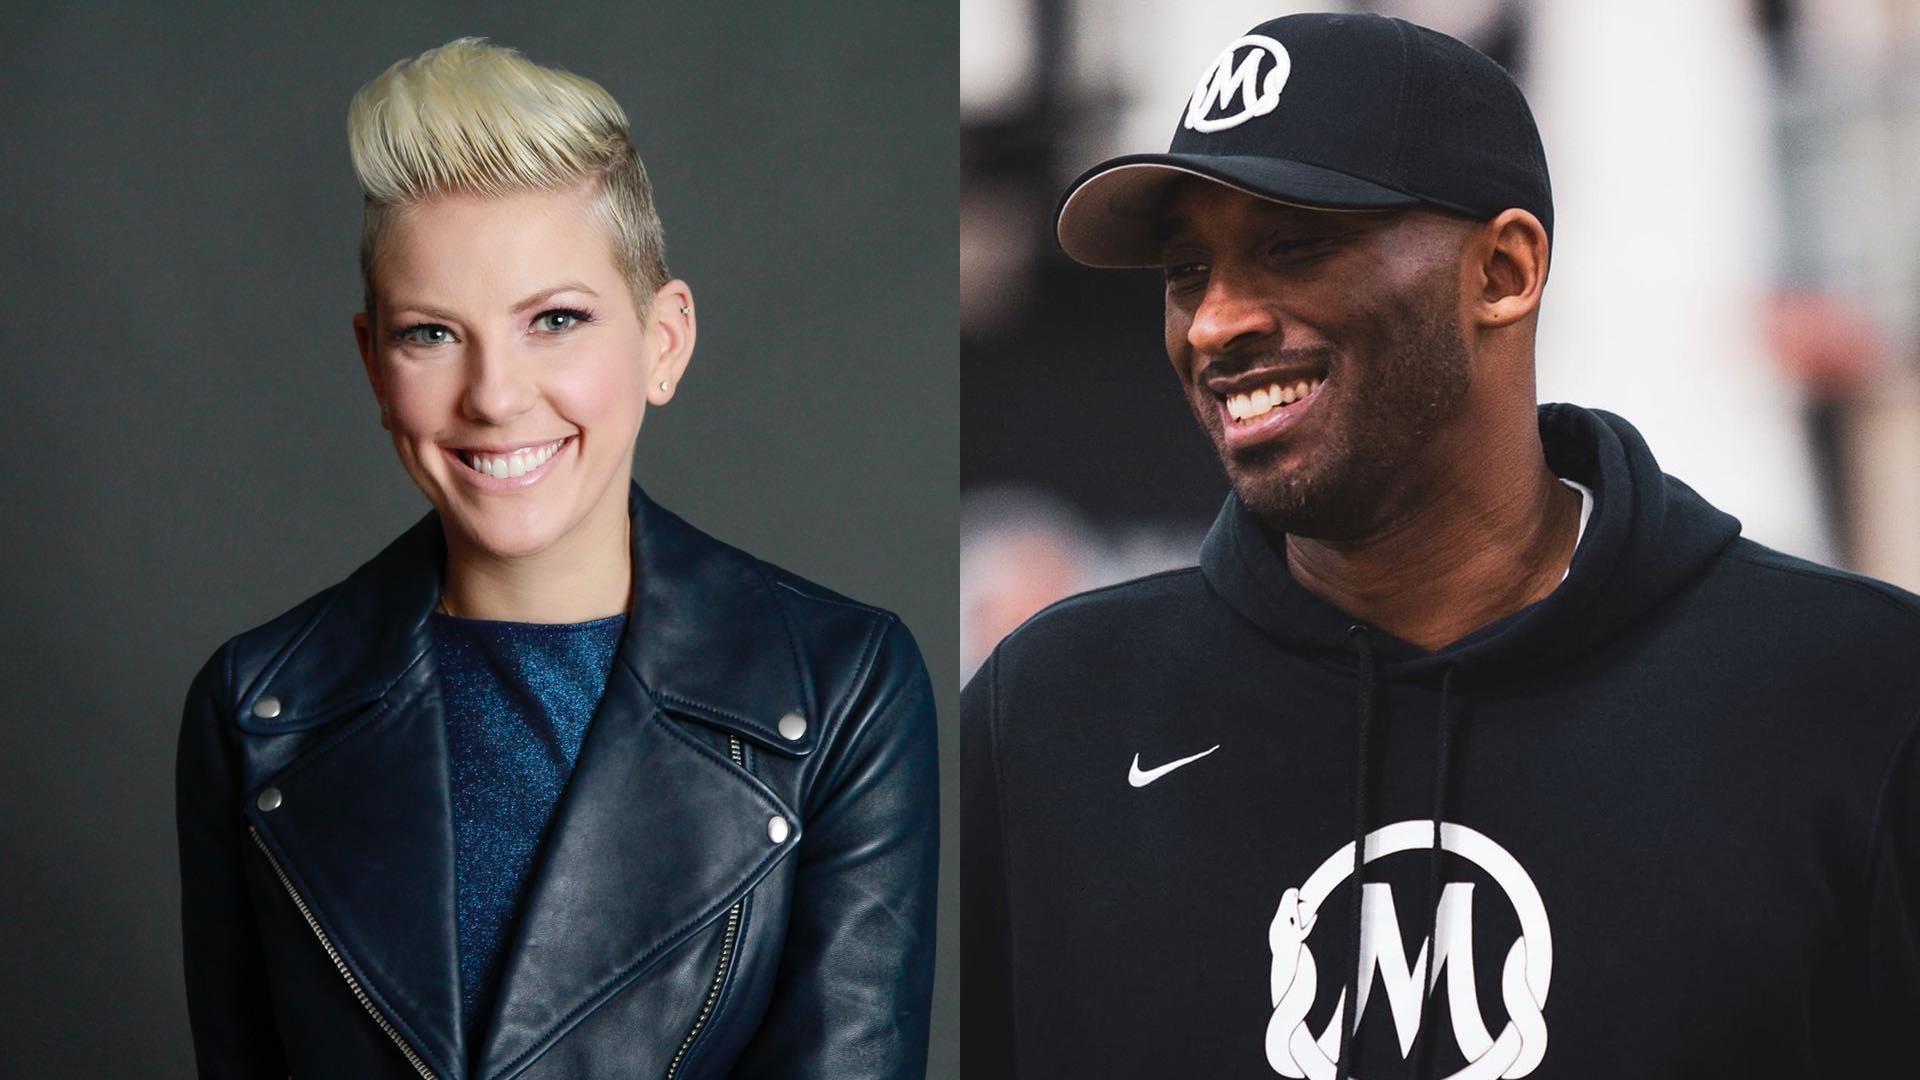 Слева —Элисон Моррис, справа —Коби Брайант. Фото © Instagram / slowmotion00, alisonmorrisnow